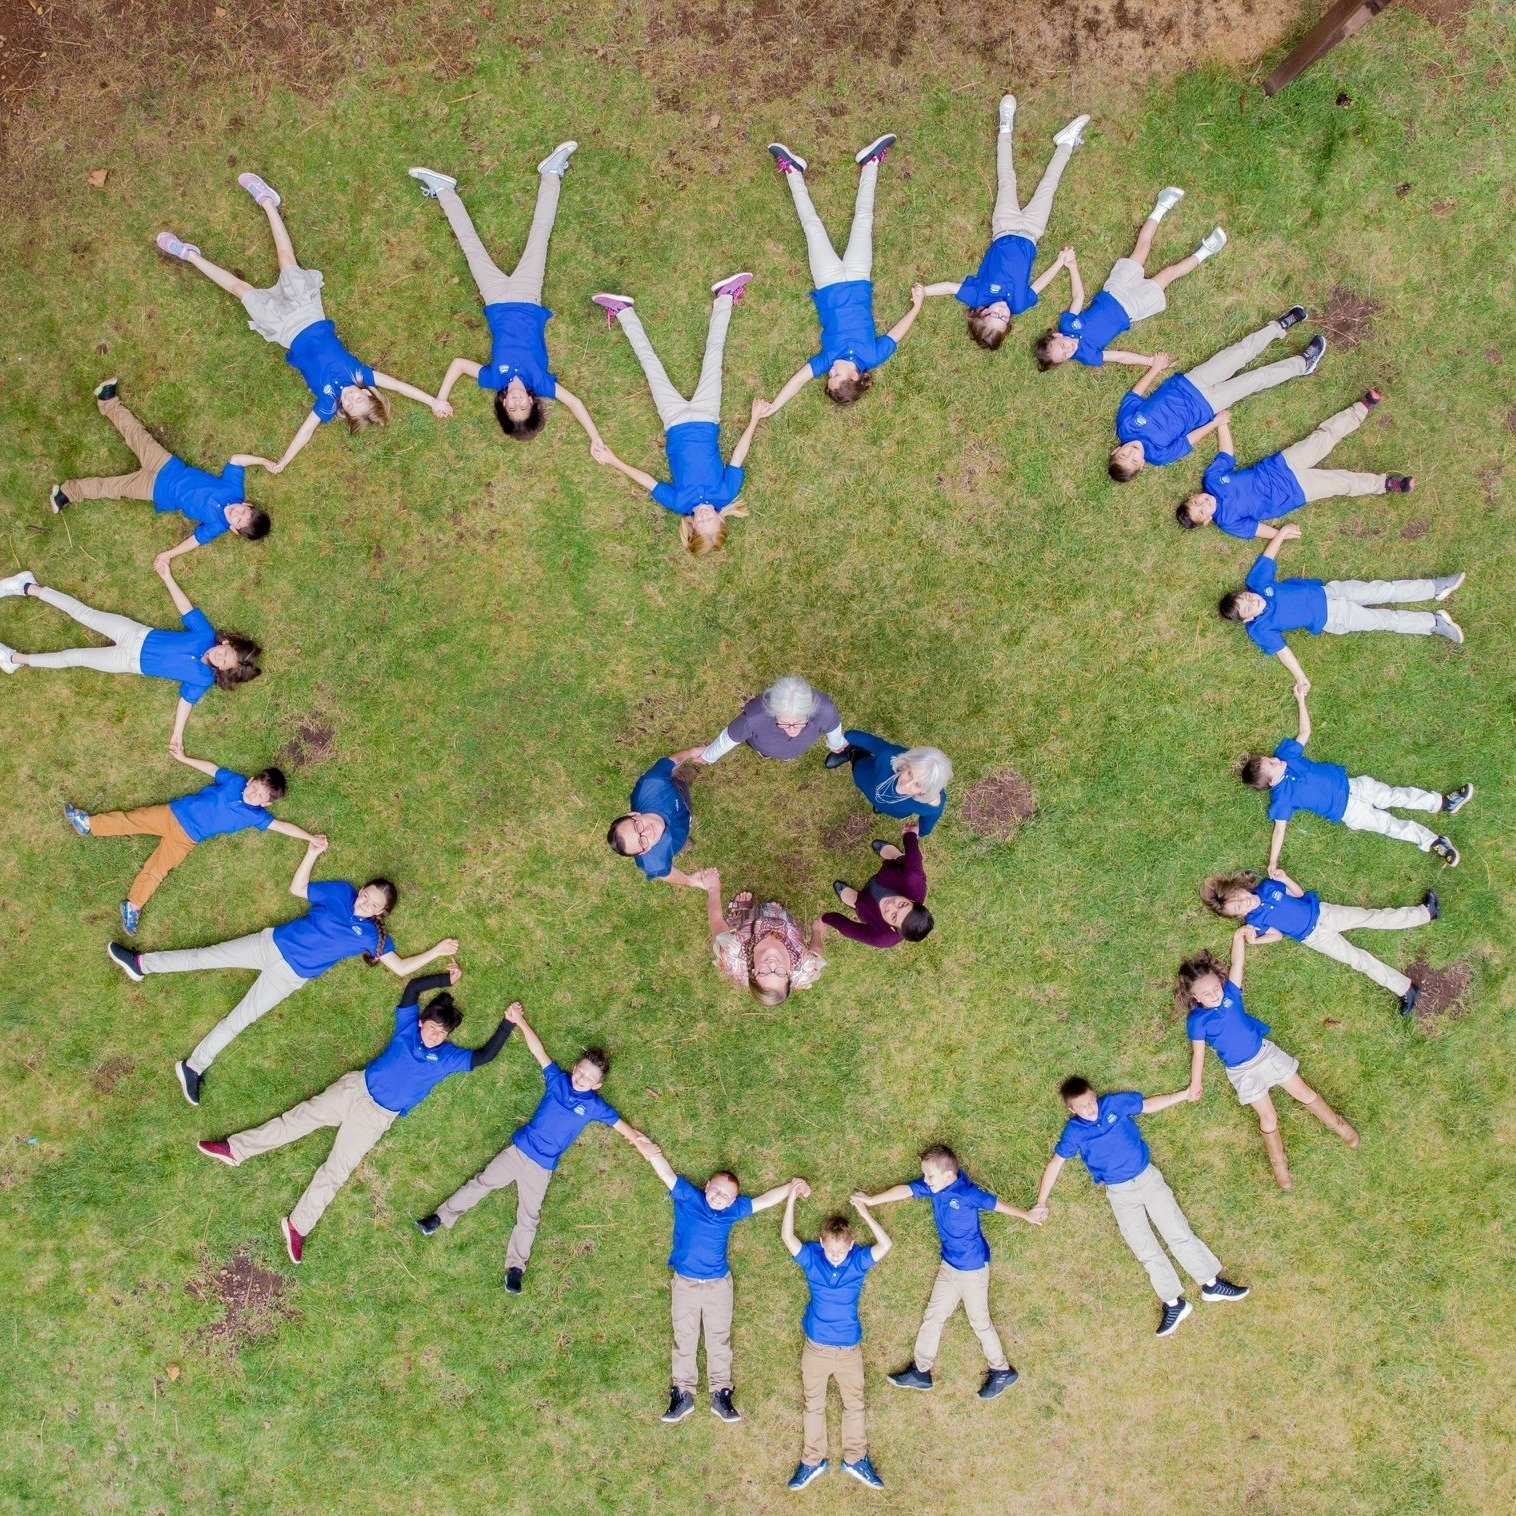 Lake Almanor Christian School